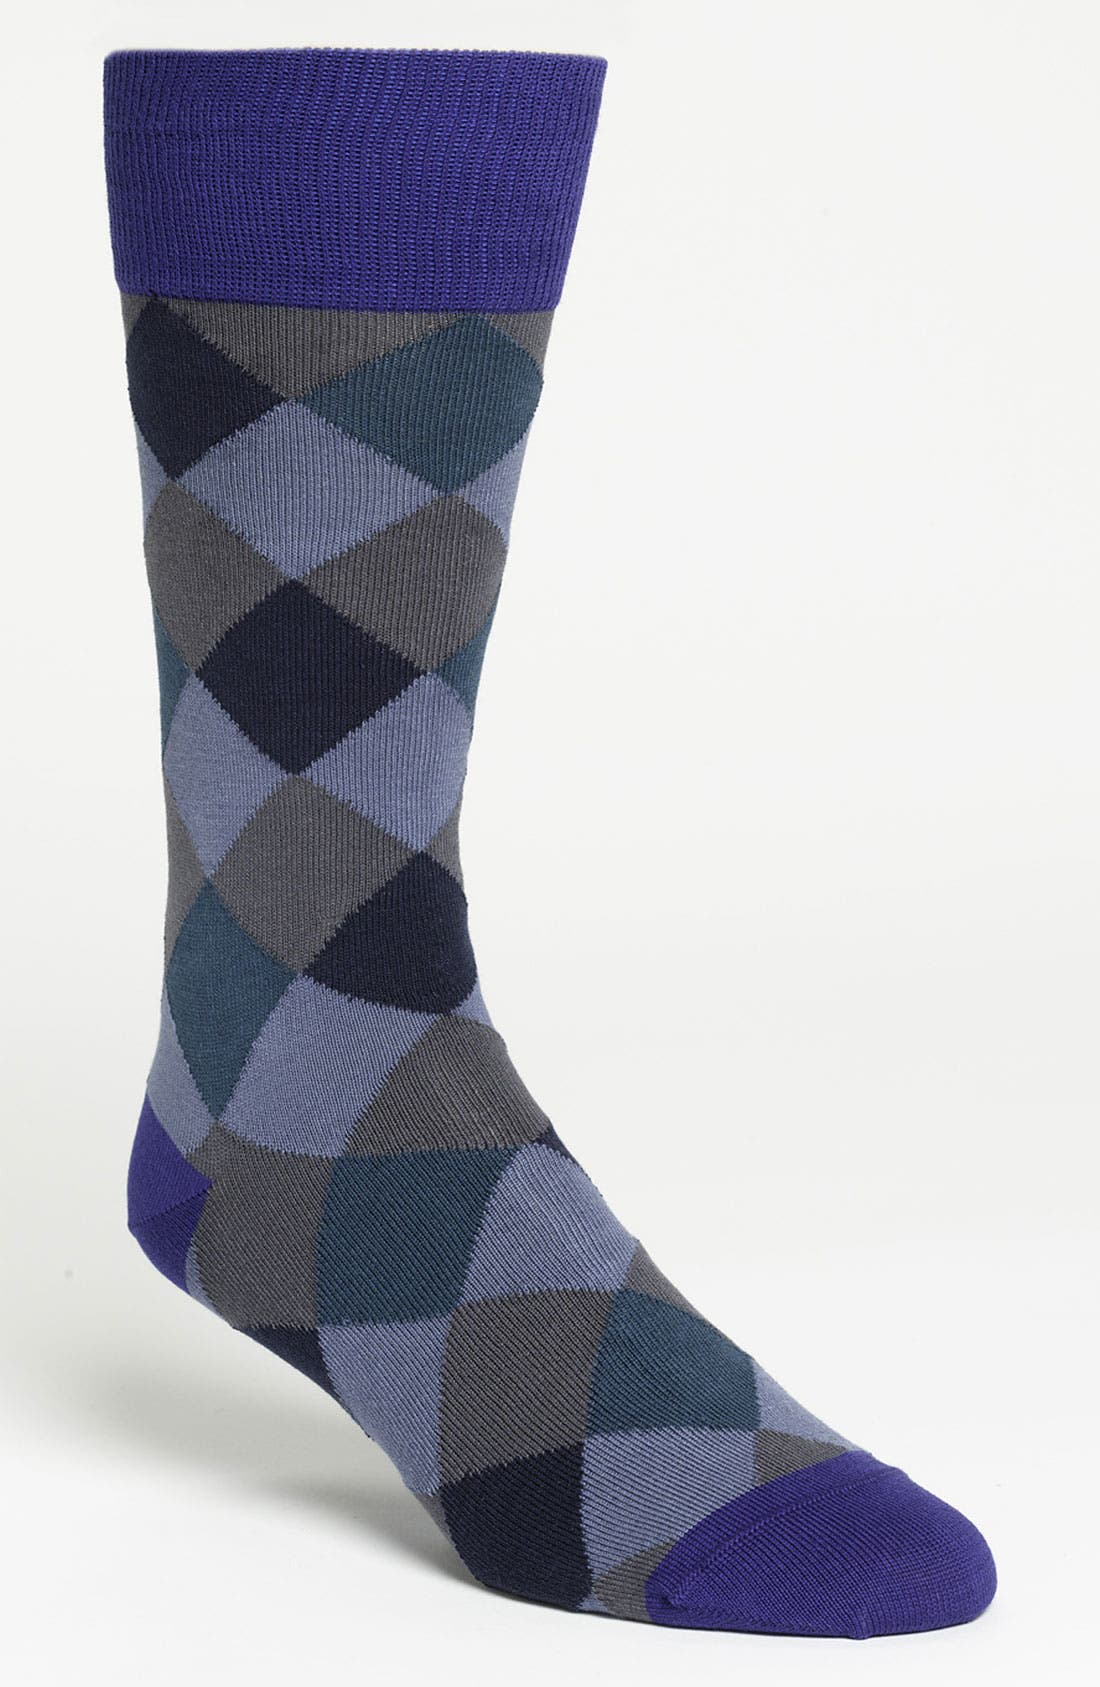 Alternate Image 1 Selected - Paul Smith Accessories Harlequin Diamond Socks